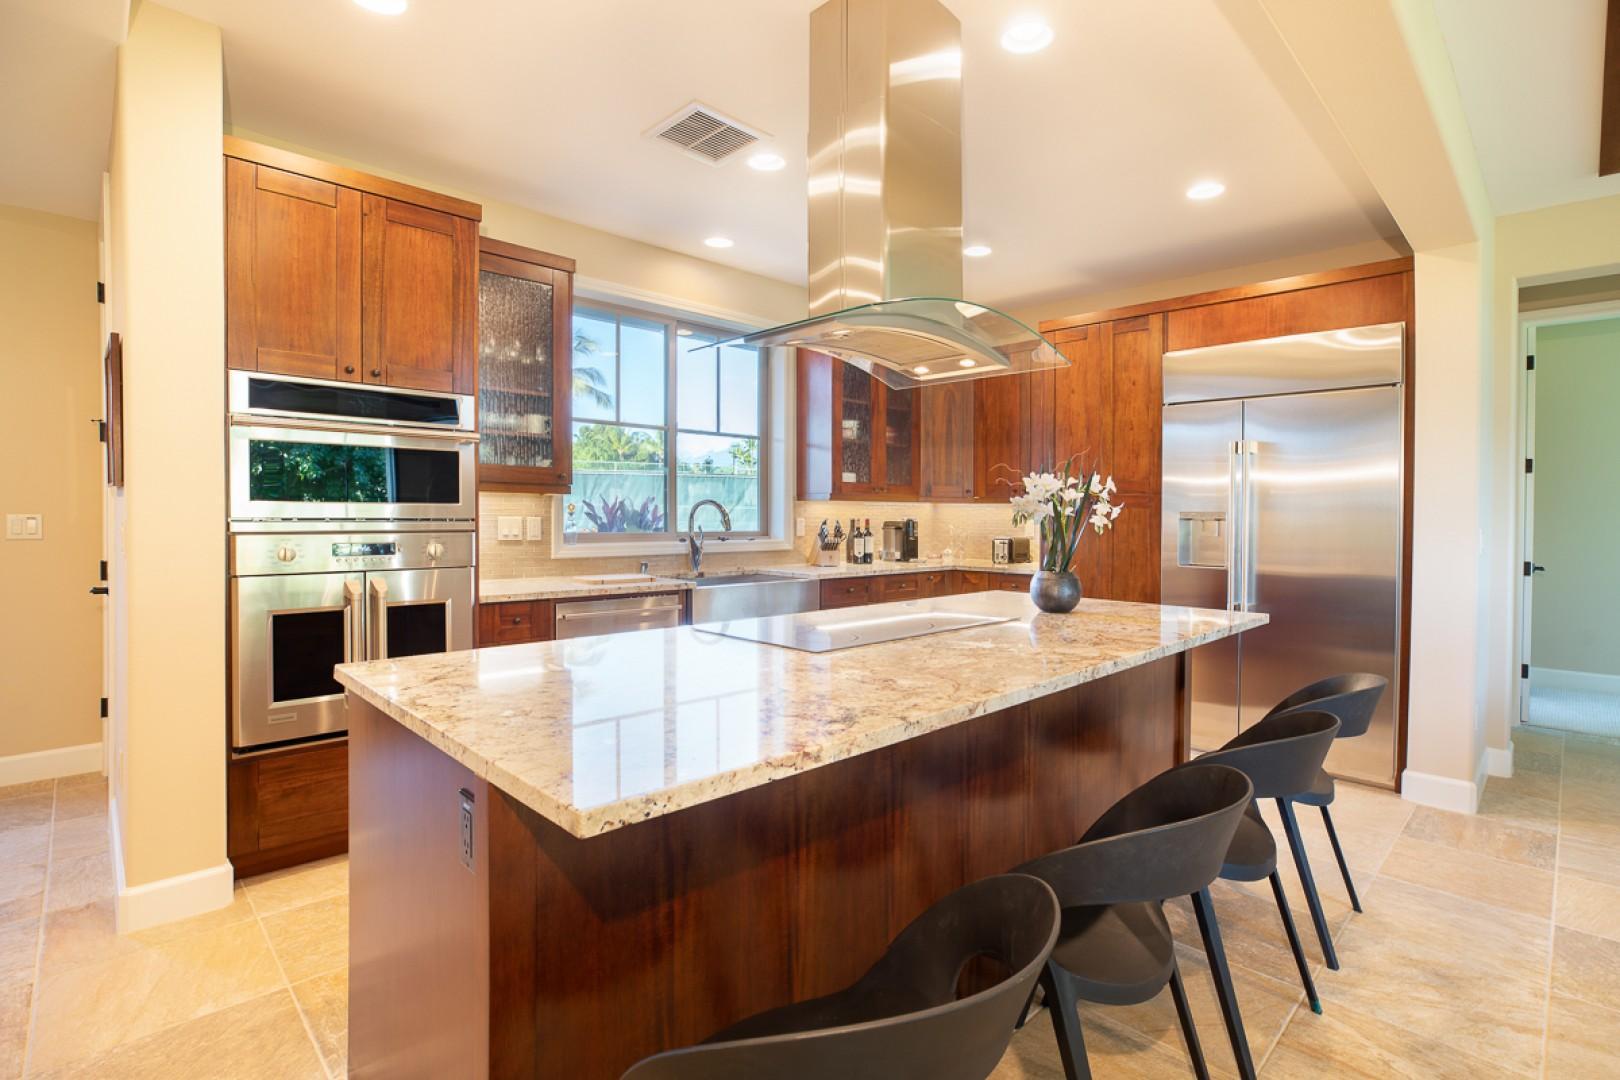 High end appliances new kitchen